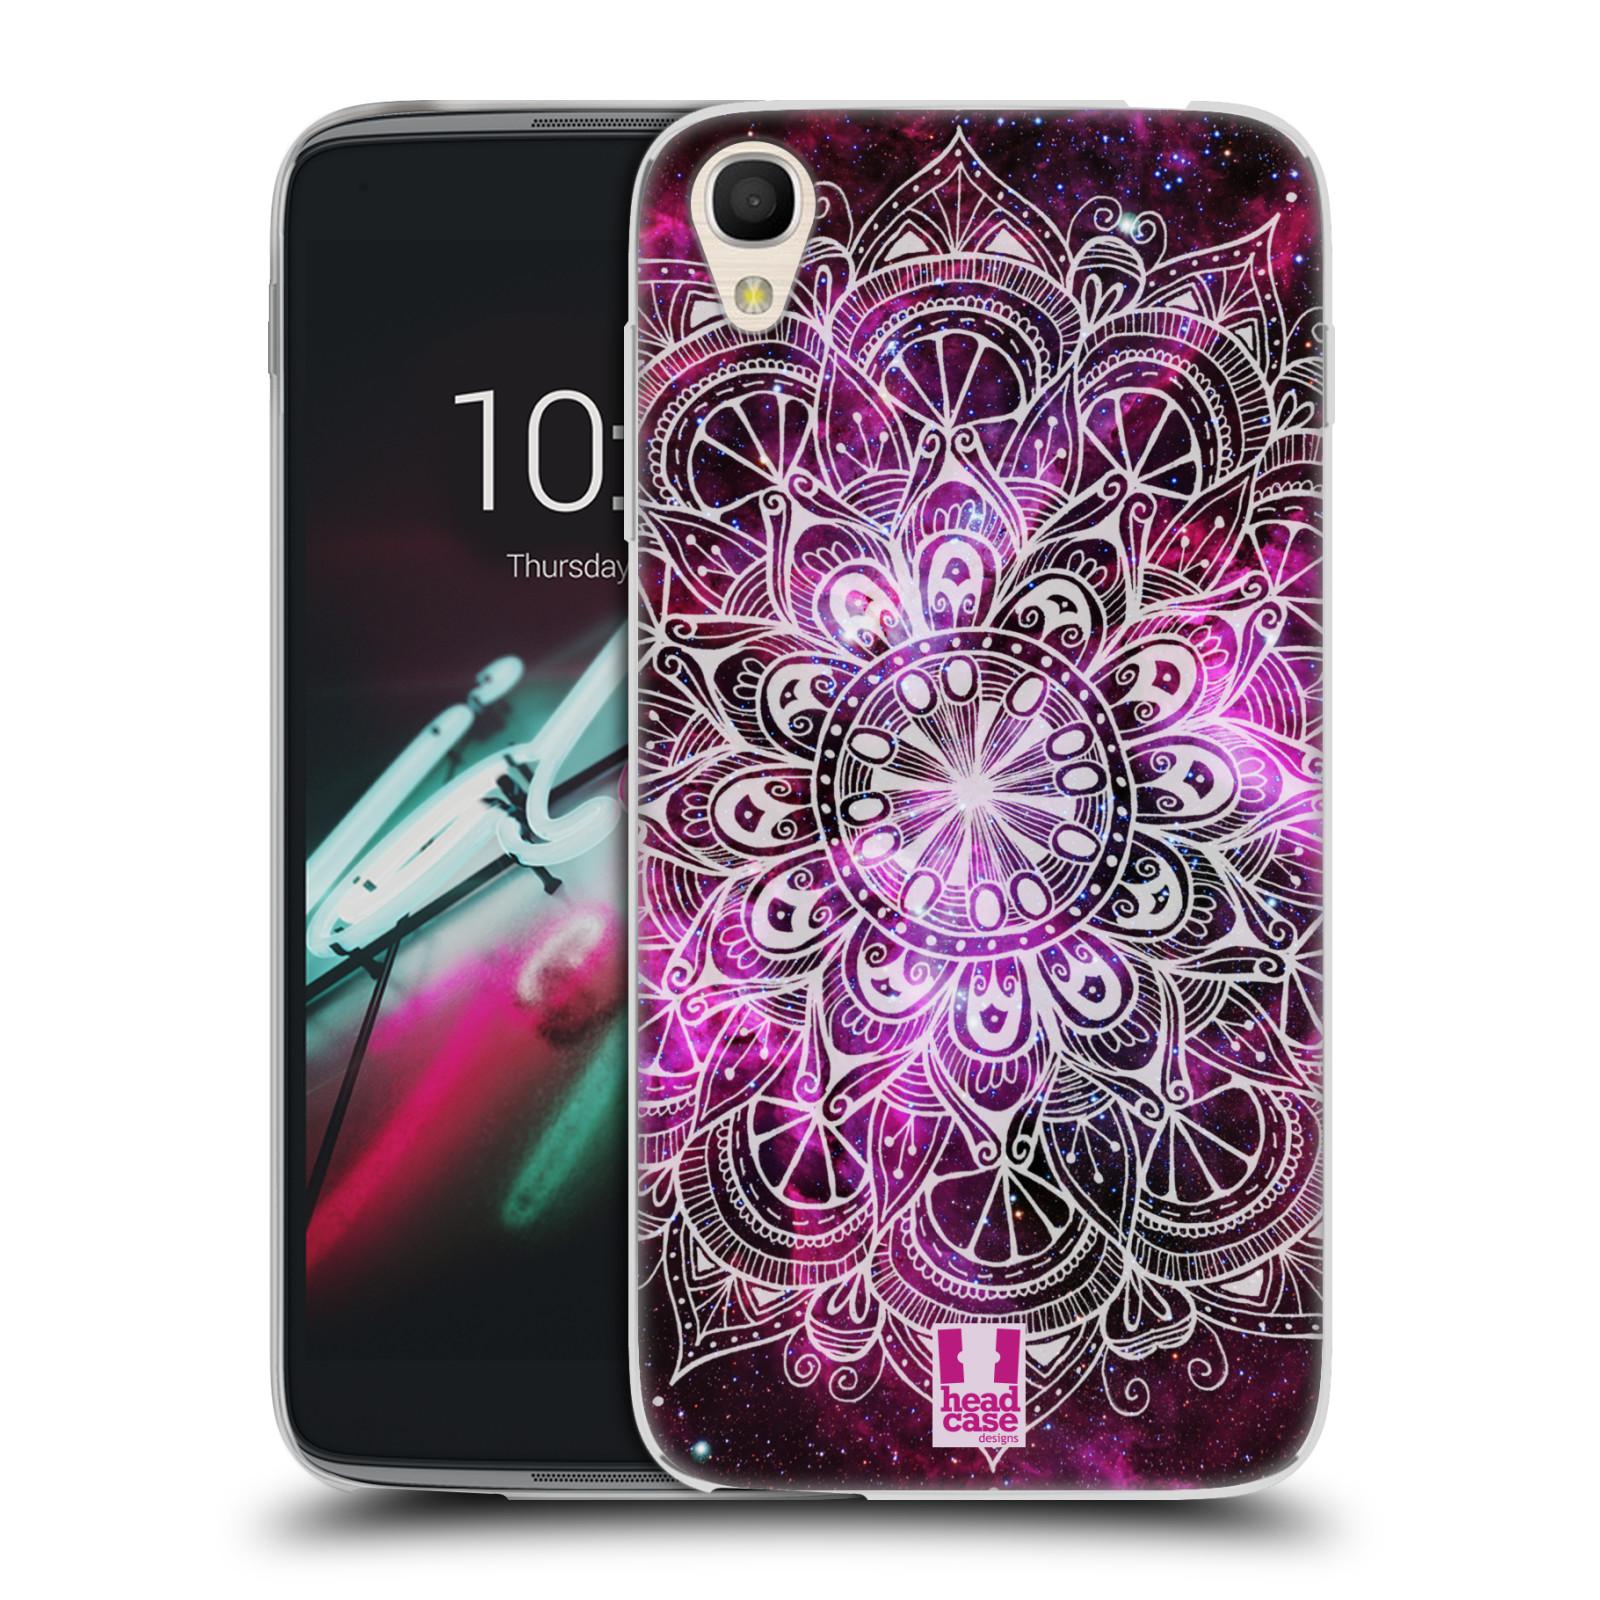 HEAD CASE silikonový obal na mobil Alcatel Idol 3 OT-6039Y (4.7) vzor Indie Mandala slunce barevná FIALOVÁ MLHOVINA